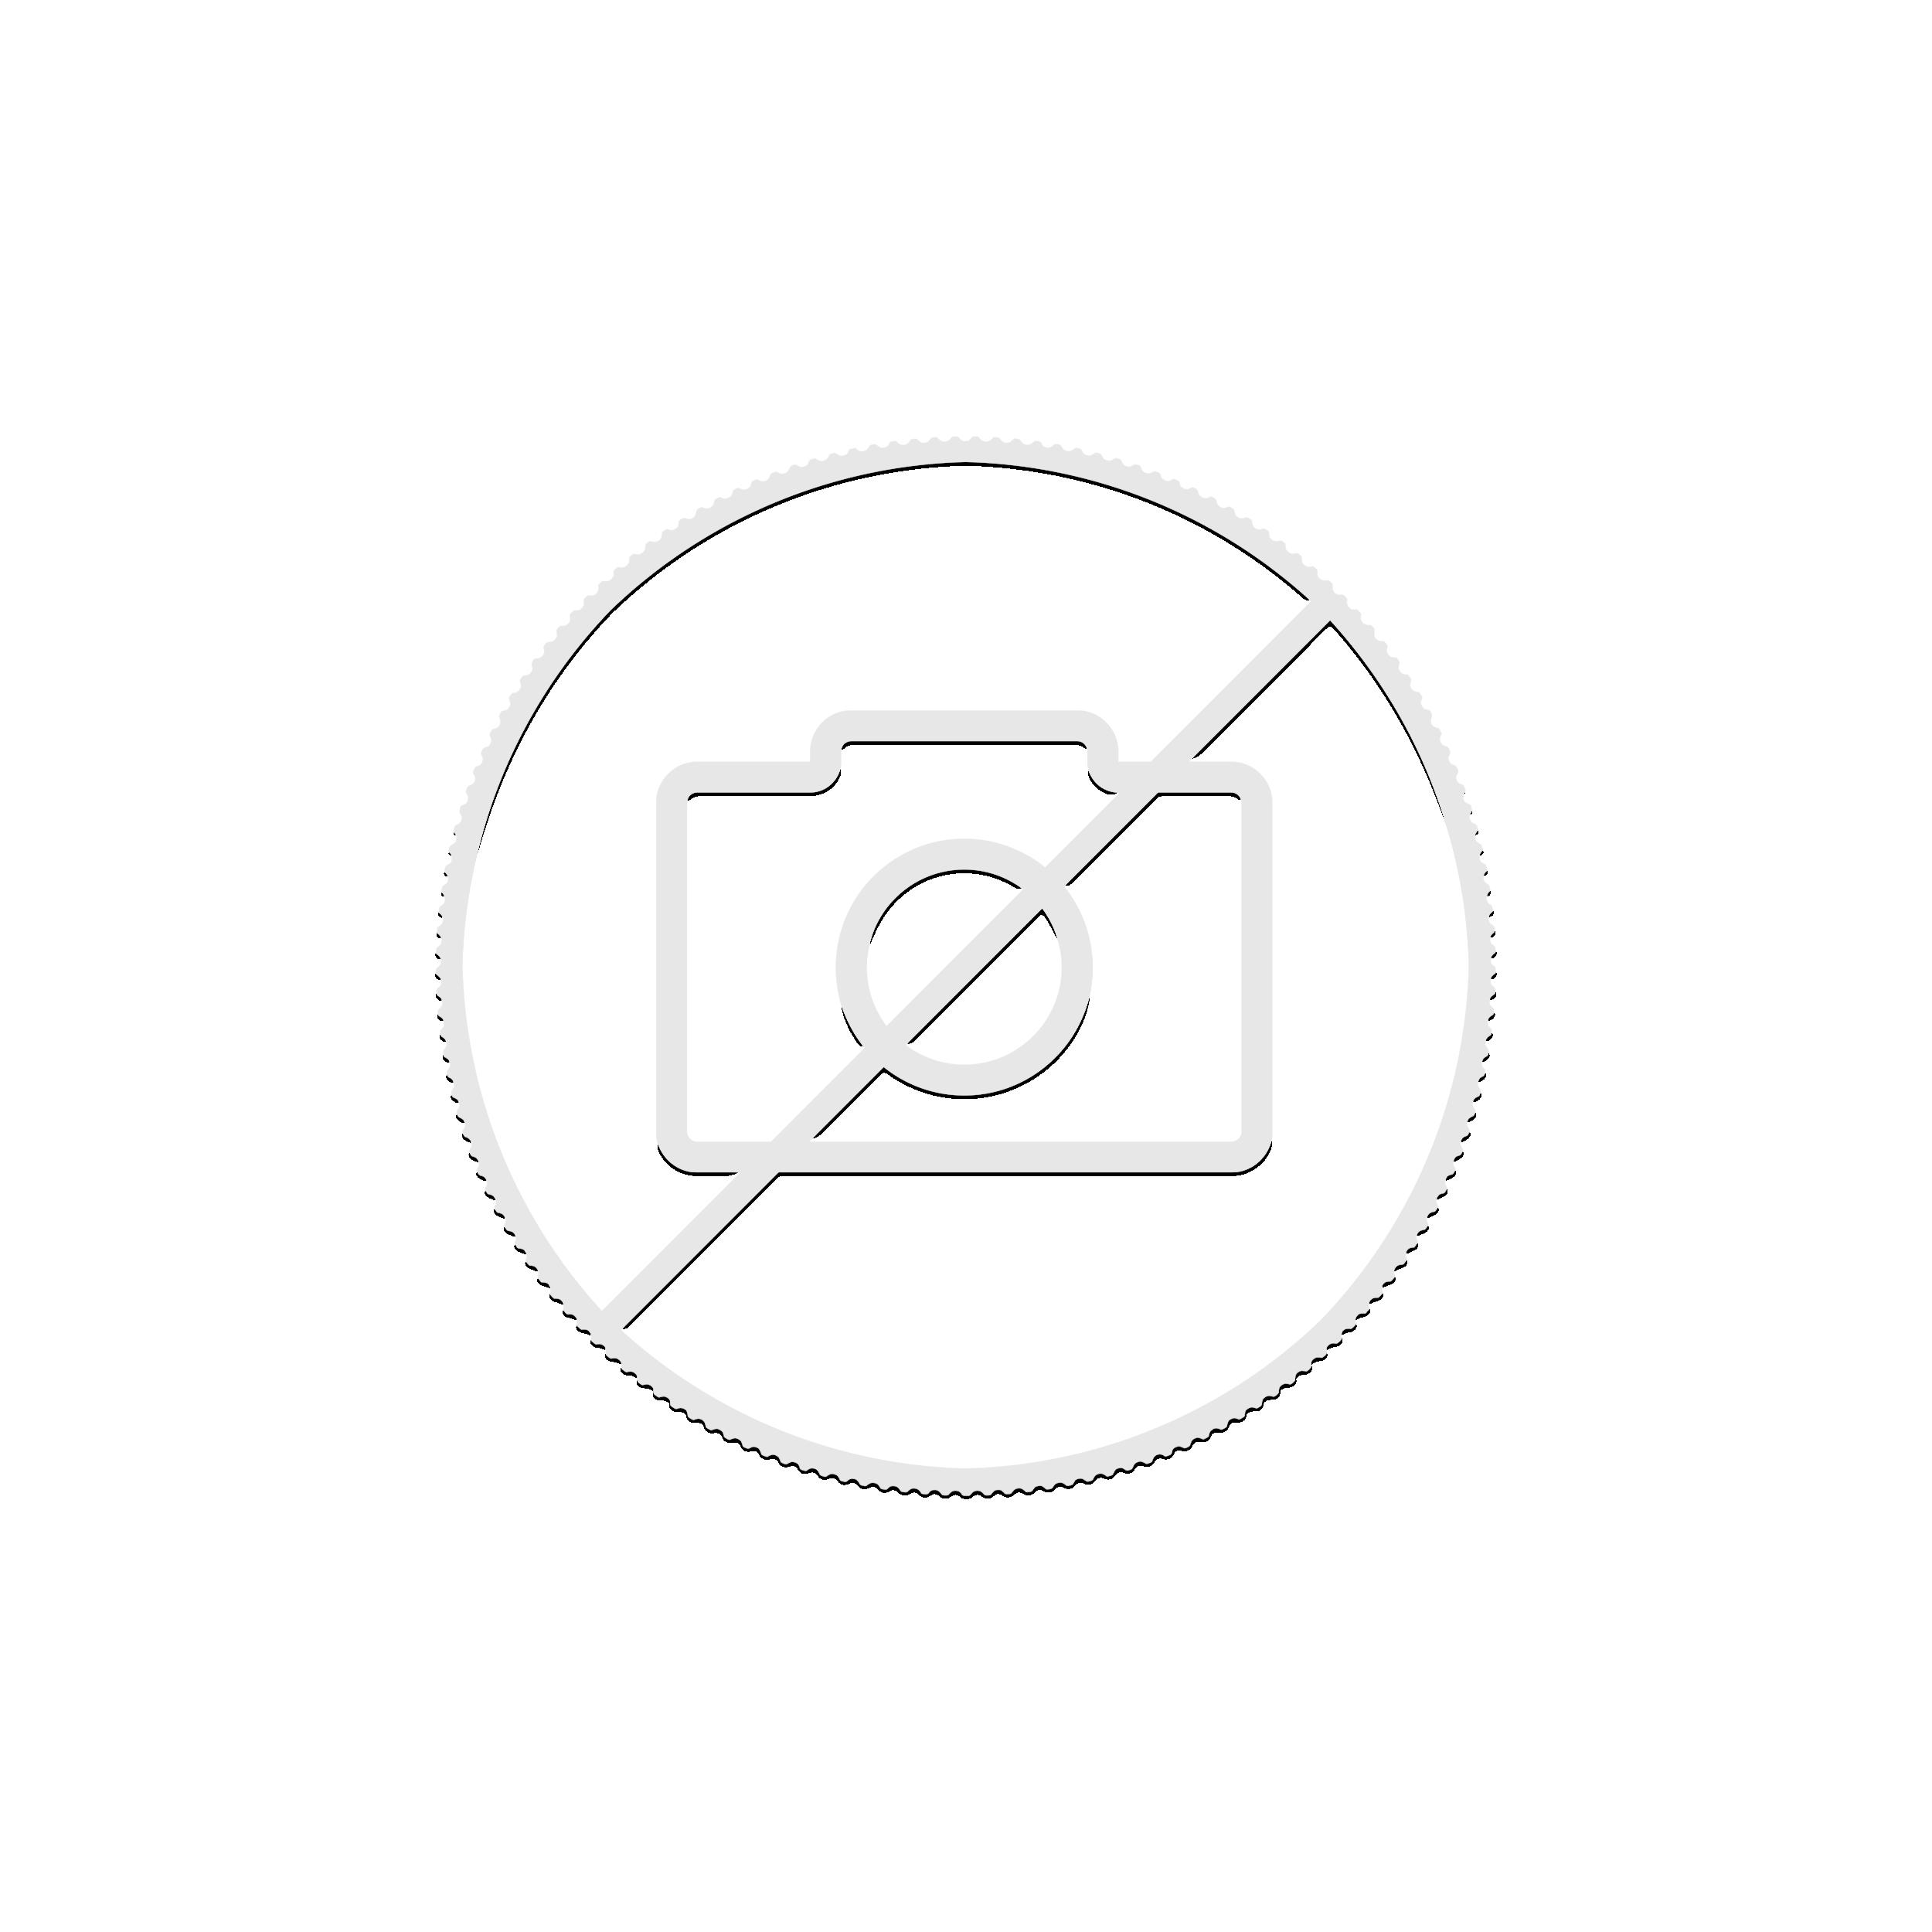 2 troy ounce zilveren munt Tossakan 2020